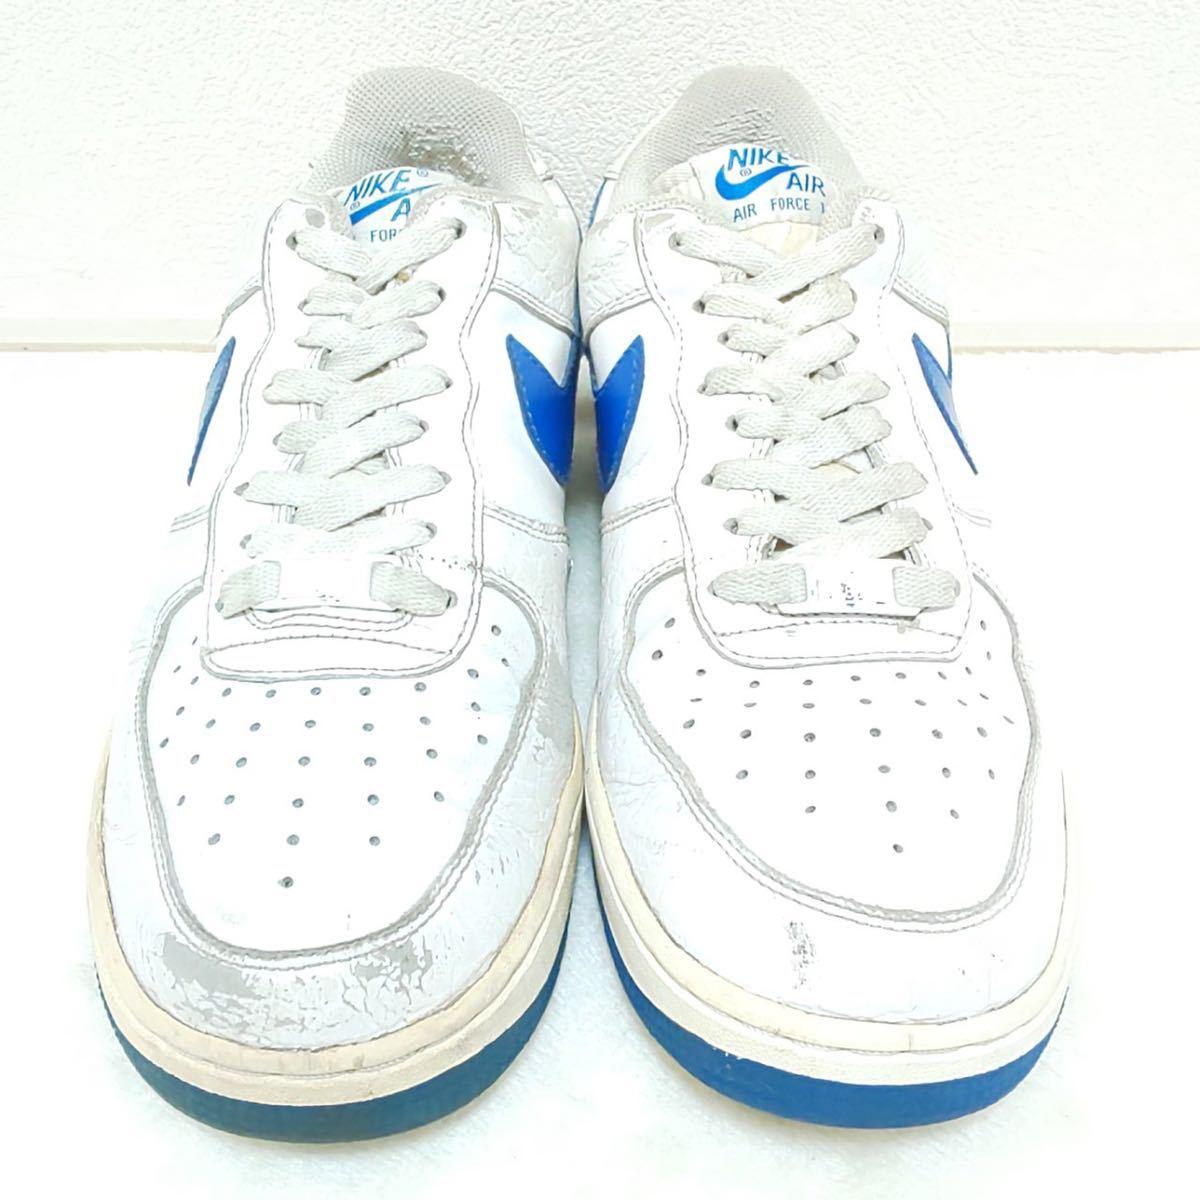 '07【NIKE】ナイキ AIR FORCE1 エアーフォースワン ローカット スニーカー シューズ 靴 ホワイト ブルー カジュアル ストリート 25.5cm/jx_画像3